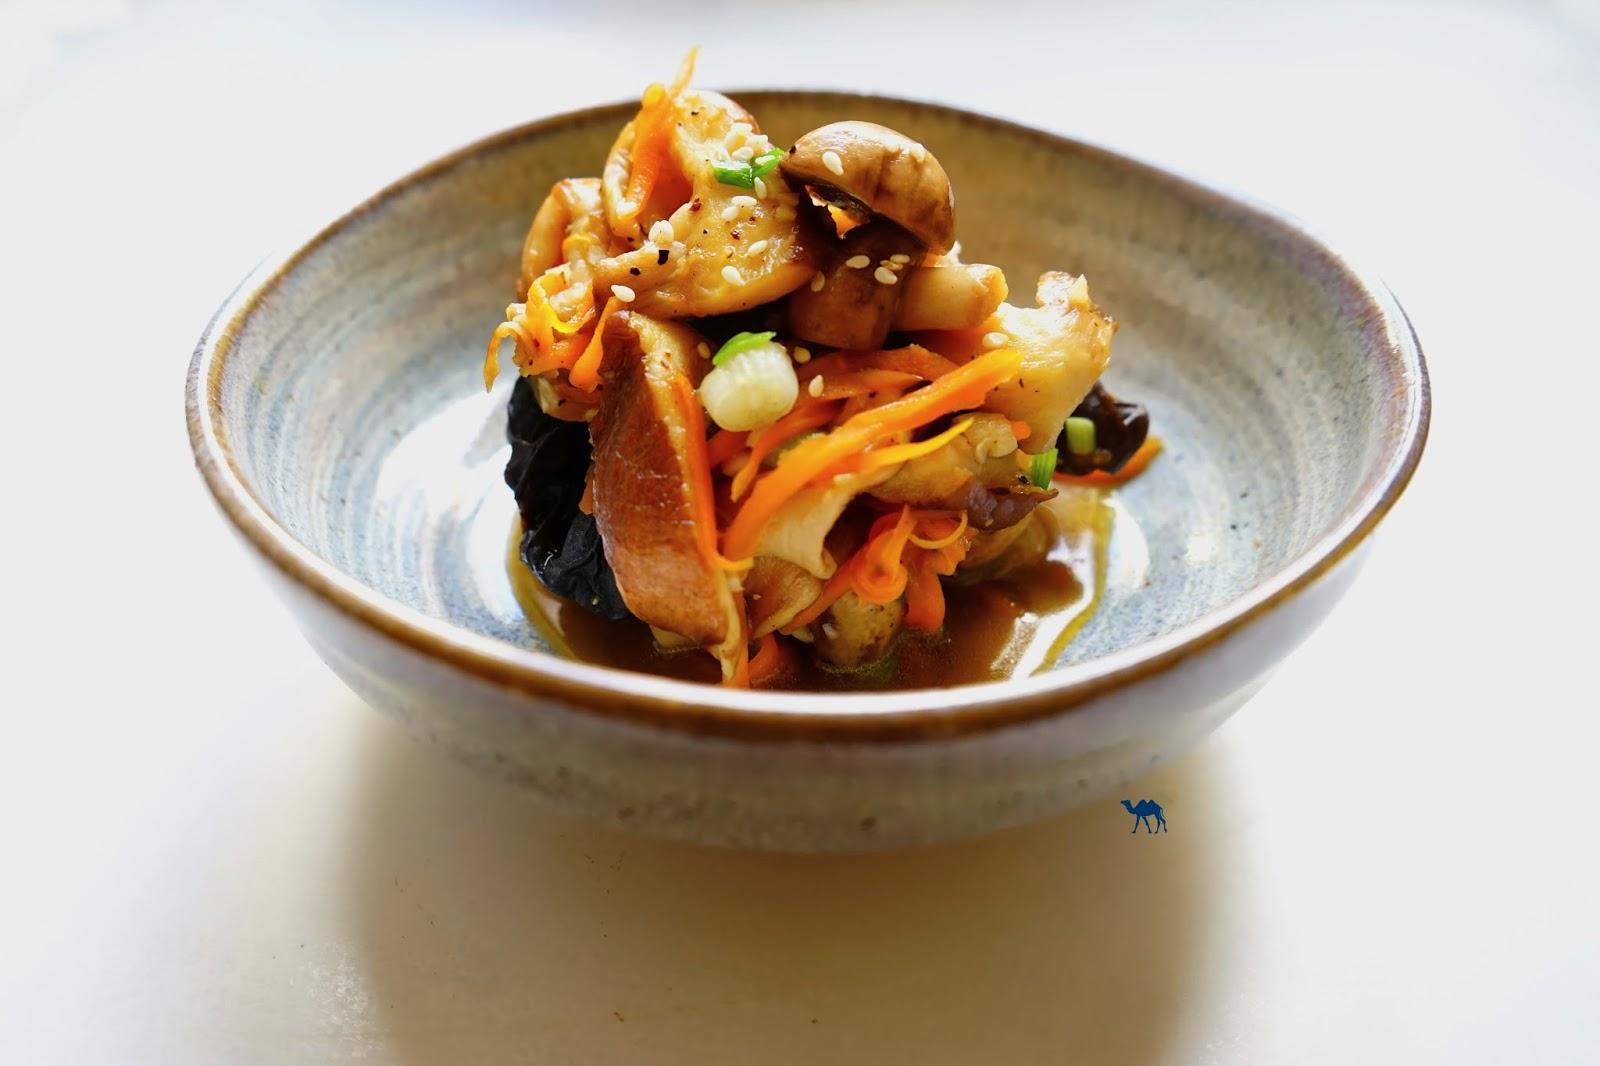 Le Chameau Bleu - Poêlée de champignon sauce teriyaki